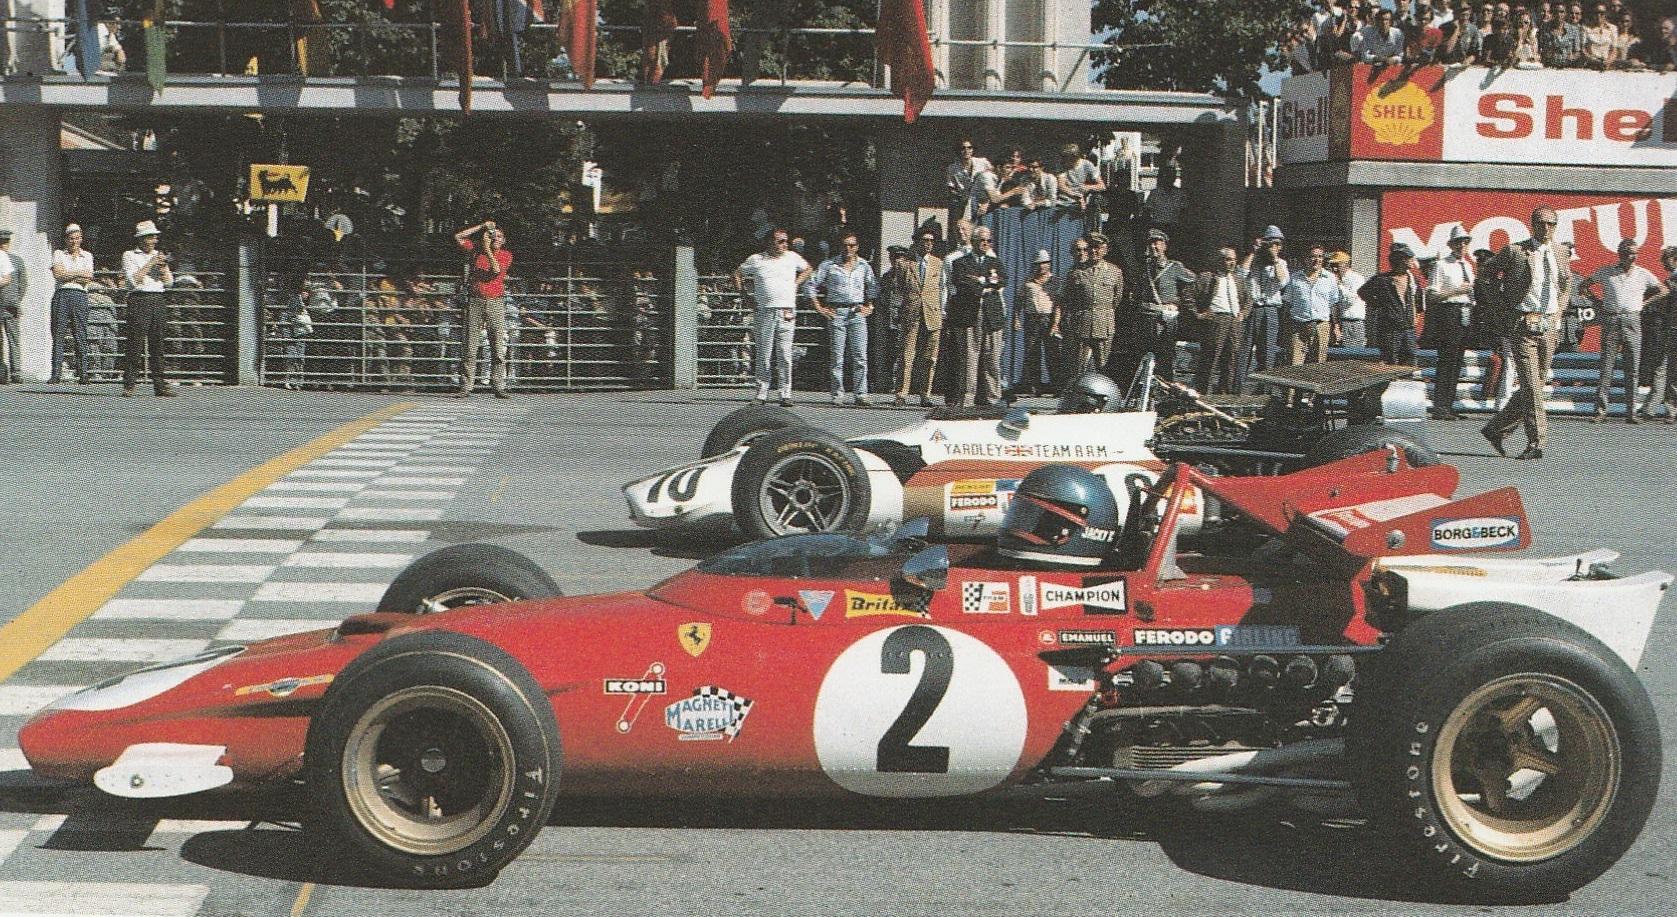 Formula 1 Emilia Romagna Grand Prix